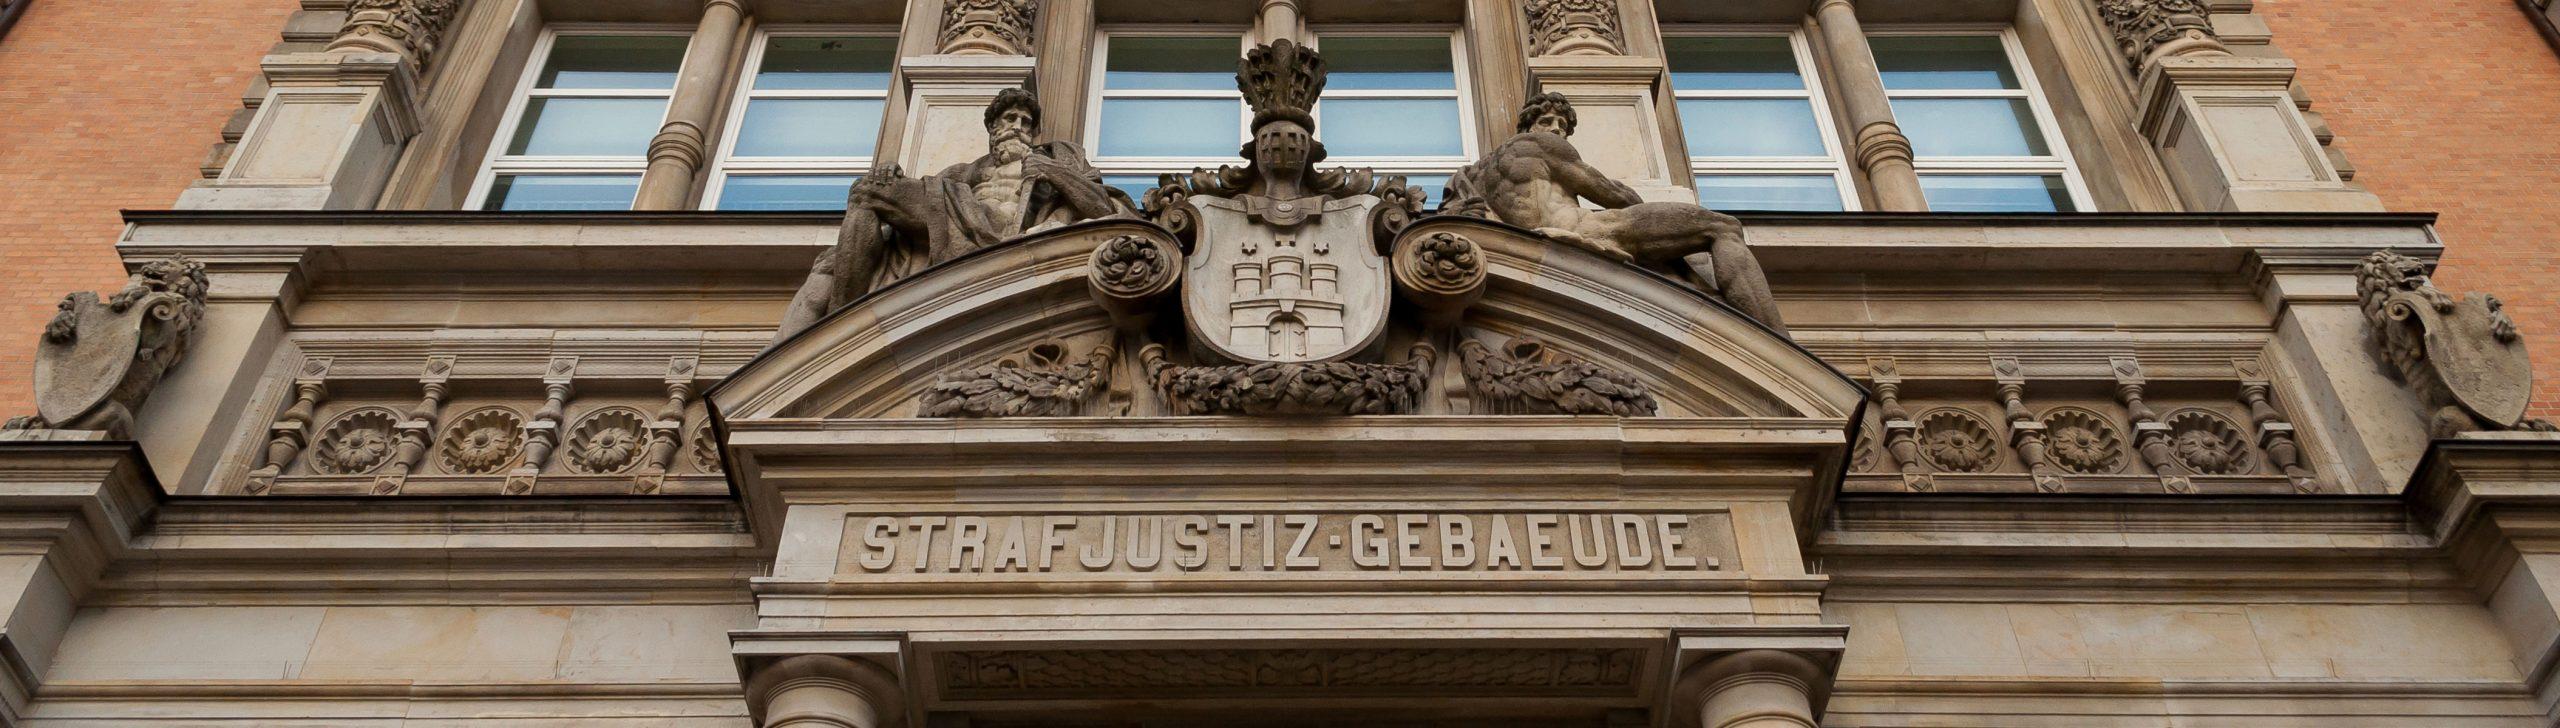 Strafjustizgebäude Hamburg / © Ajepbah / Wikimedia Commons / Lizenz: CC-BY-SA-3.0 DE